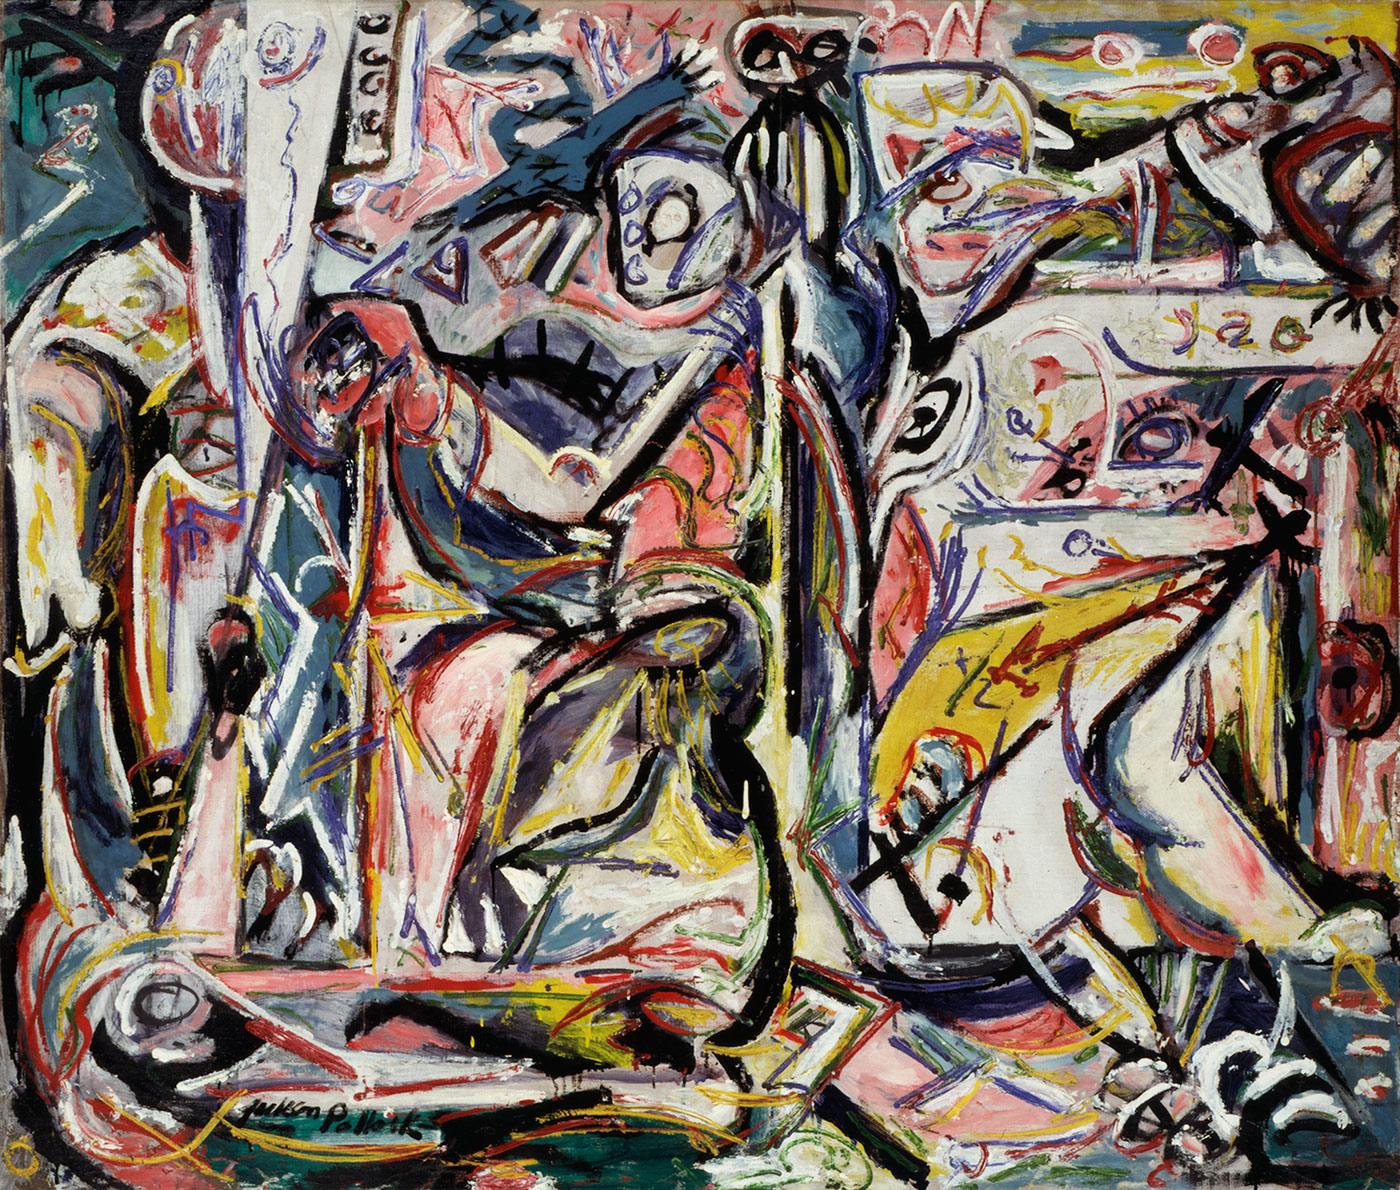 Jackson Pollock, Circoncisione(gennaio 1946; olio su tela, 142,3 x 168 cm; Venezia, Collezione Peggy Guggenheim) © Pollock-Krasner Foundation / Artists Rights Society (ARS), New